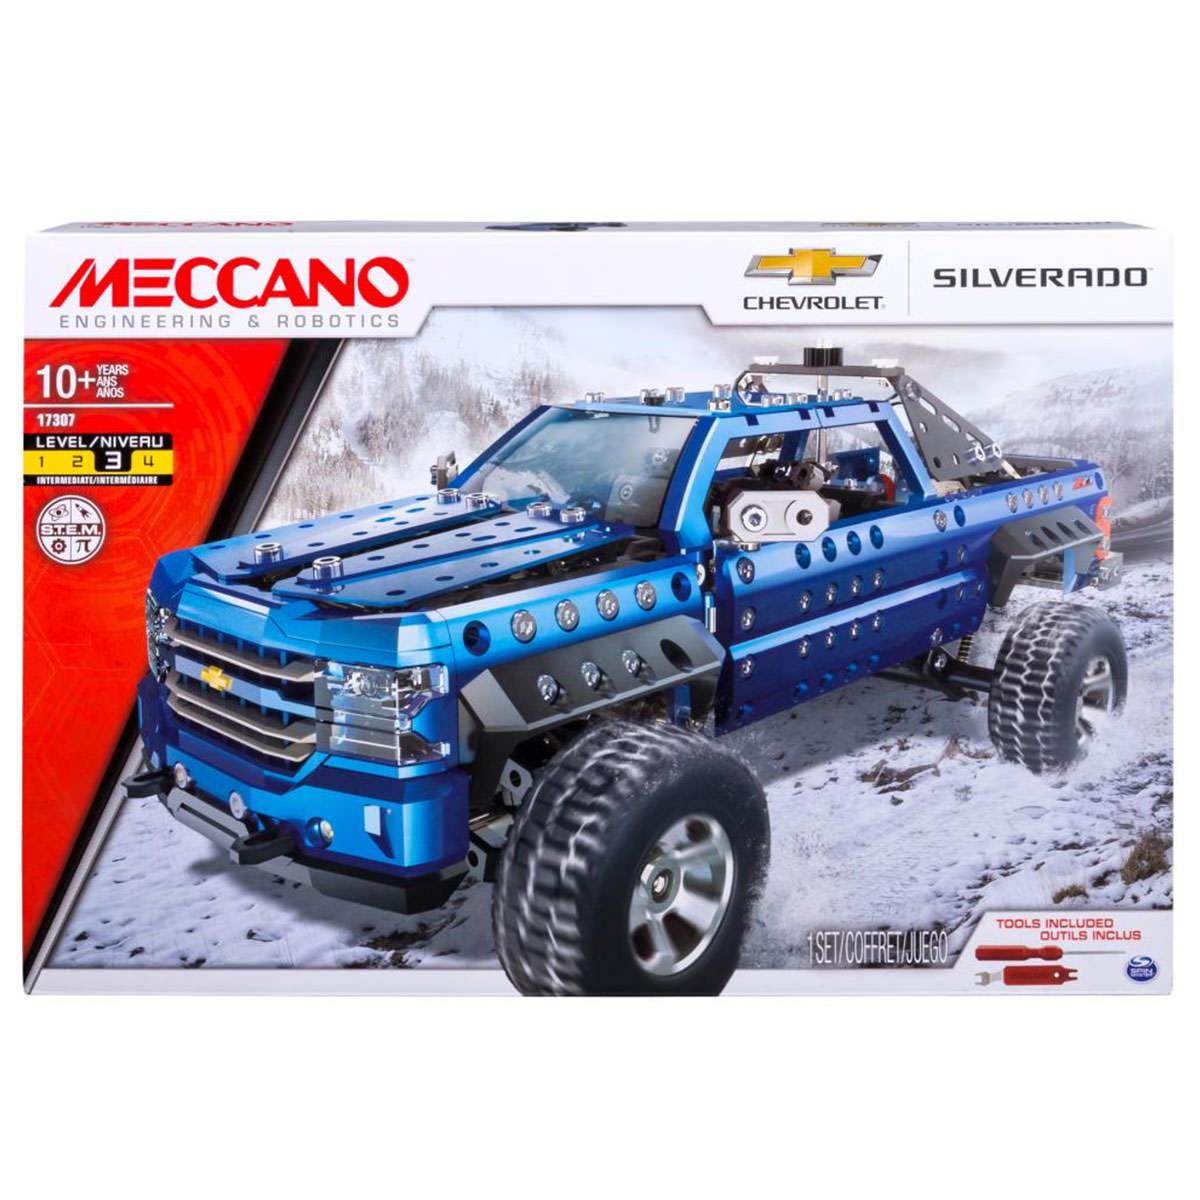 Meccano 17307 Chevrolet Silverado Pickup Truck at Toys R Us